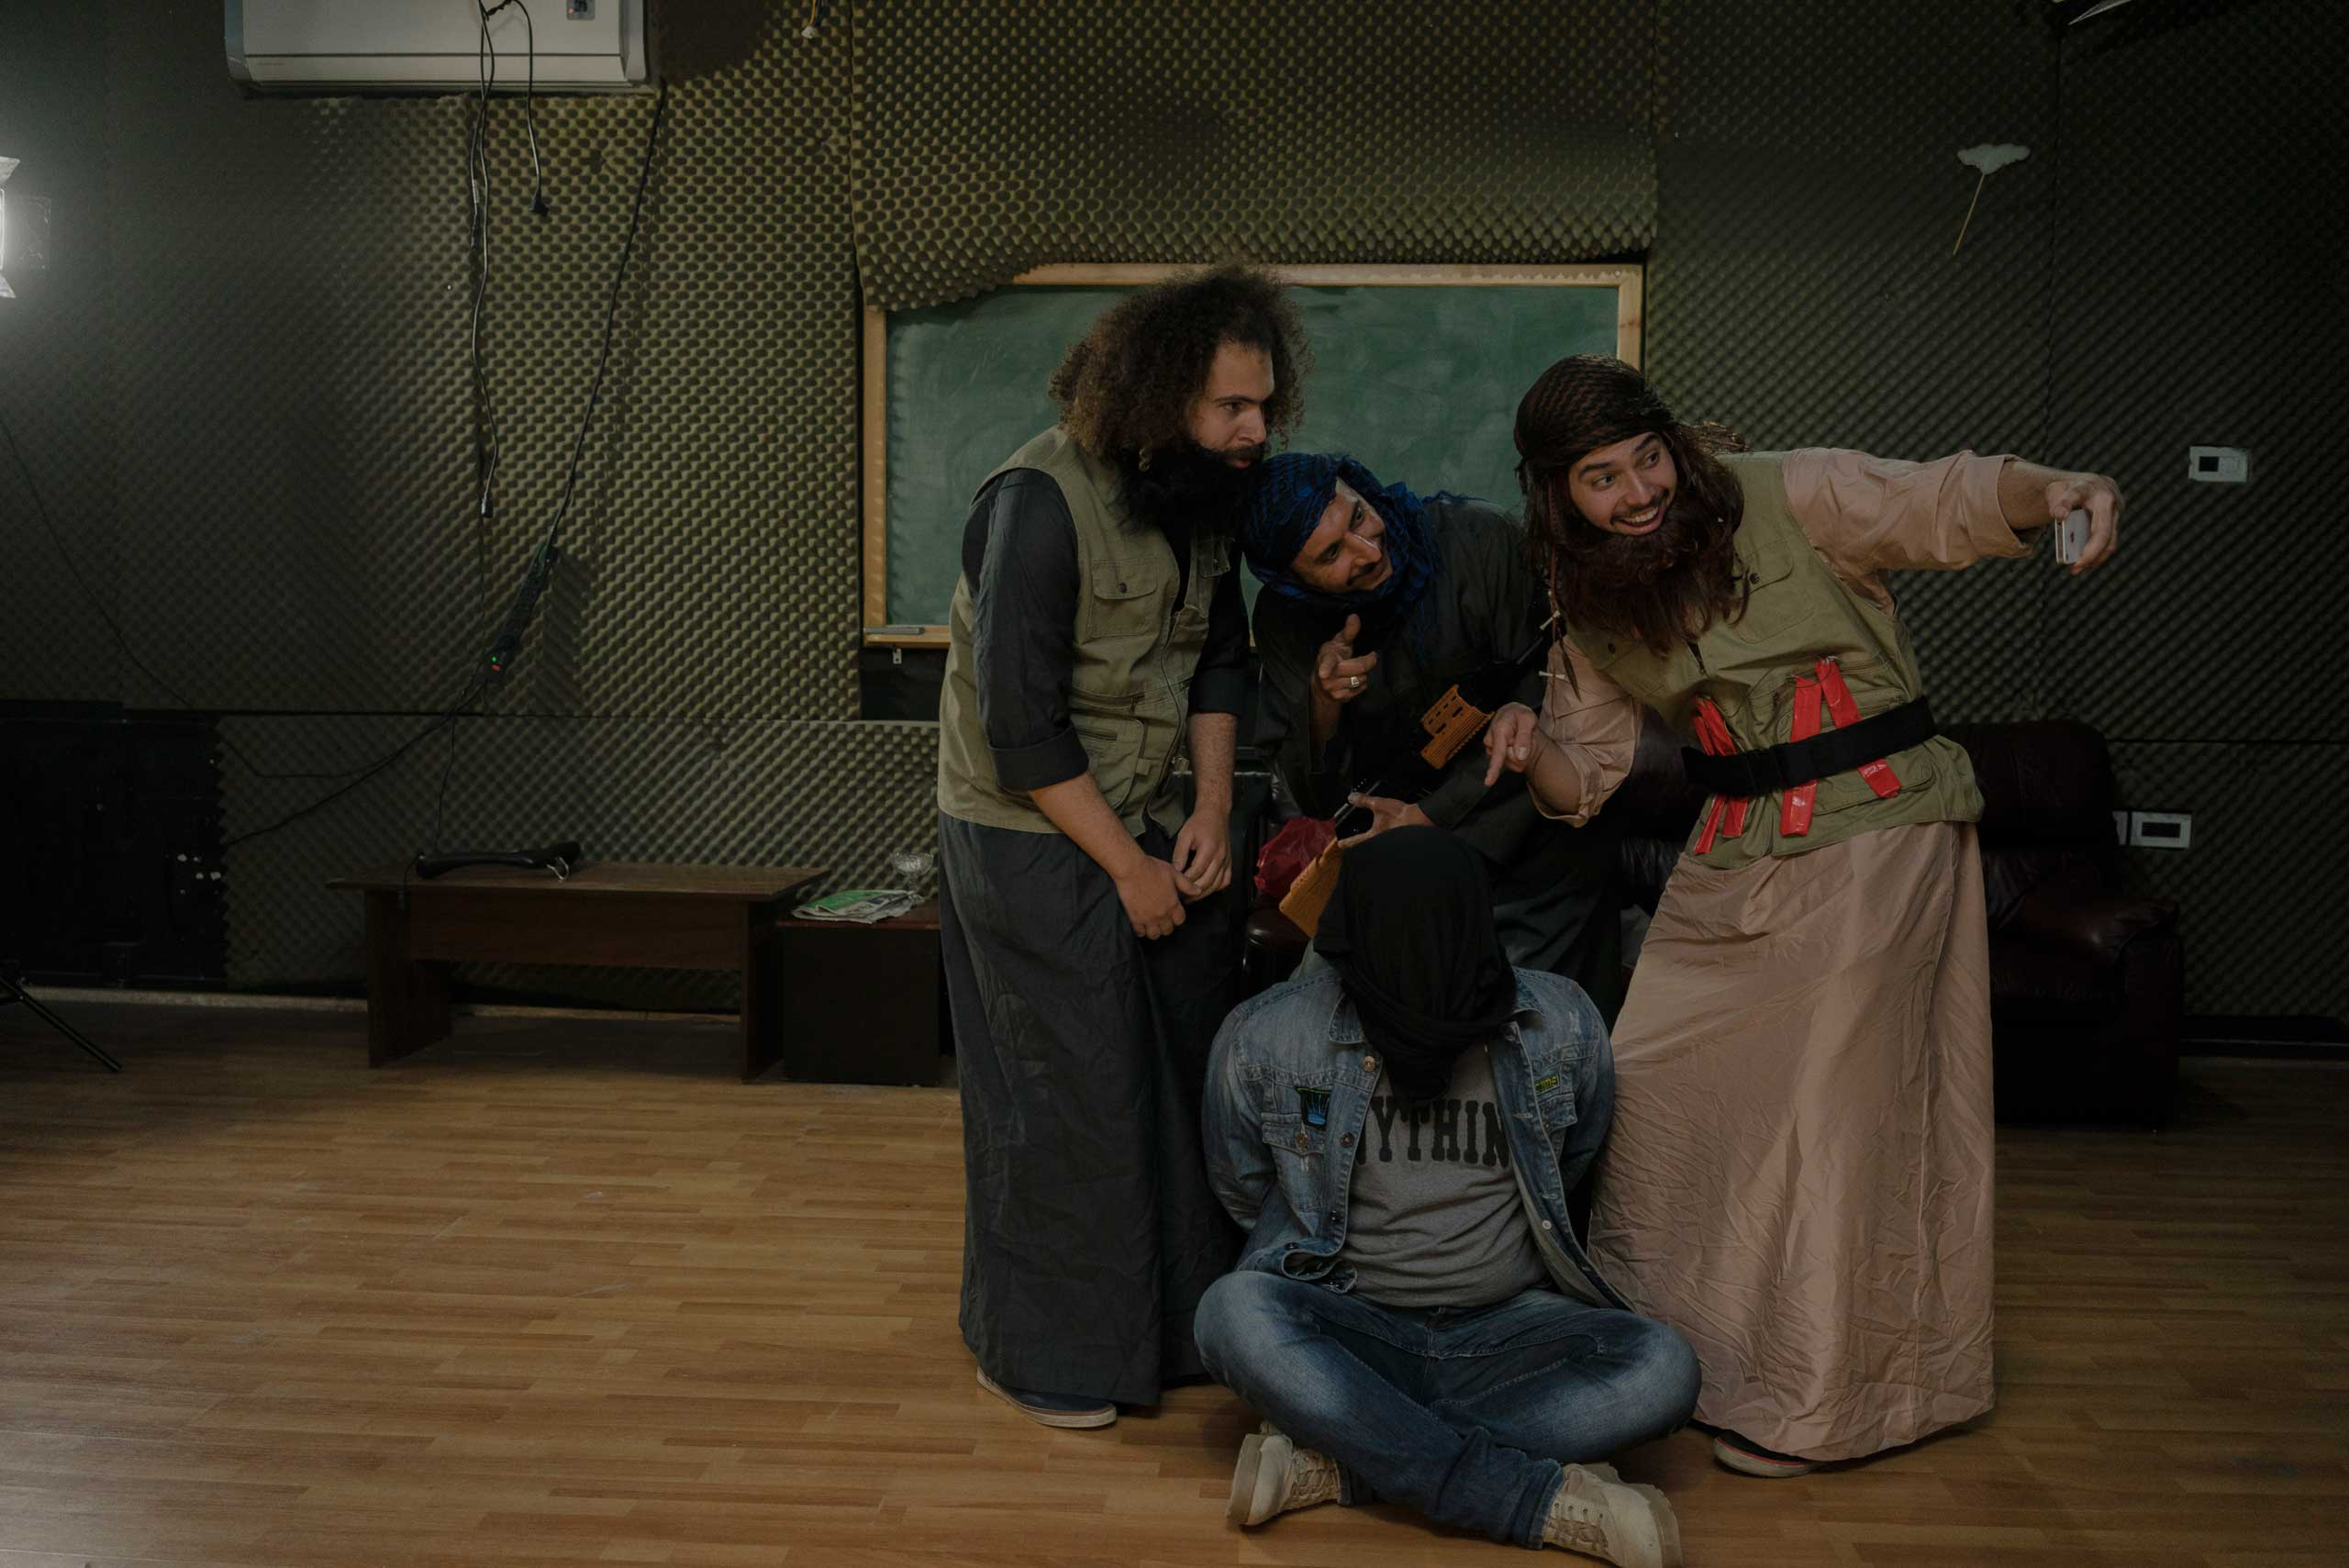 Alhakam Turki, Shwan Sarheng, Mustafa Saedi at the Al-Basheer show in Amman Jordan prepare sketches in the show's studio in Amman, Jordan.